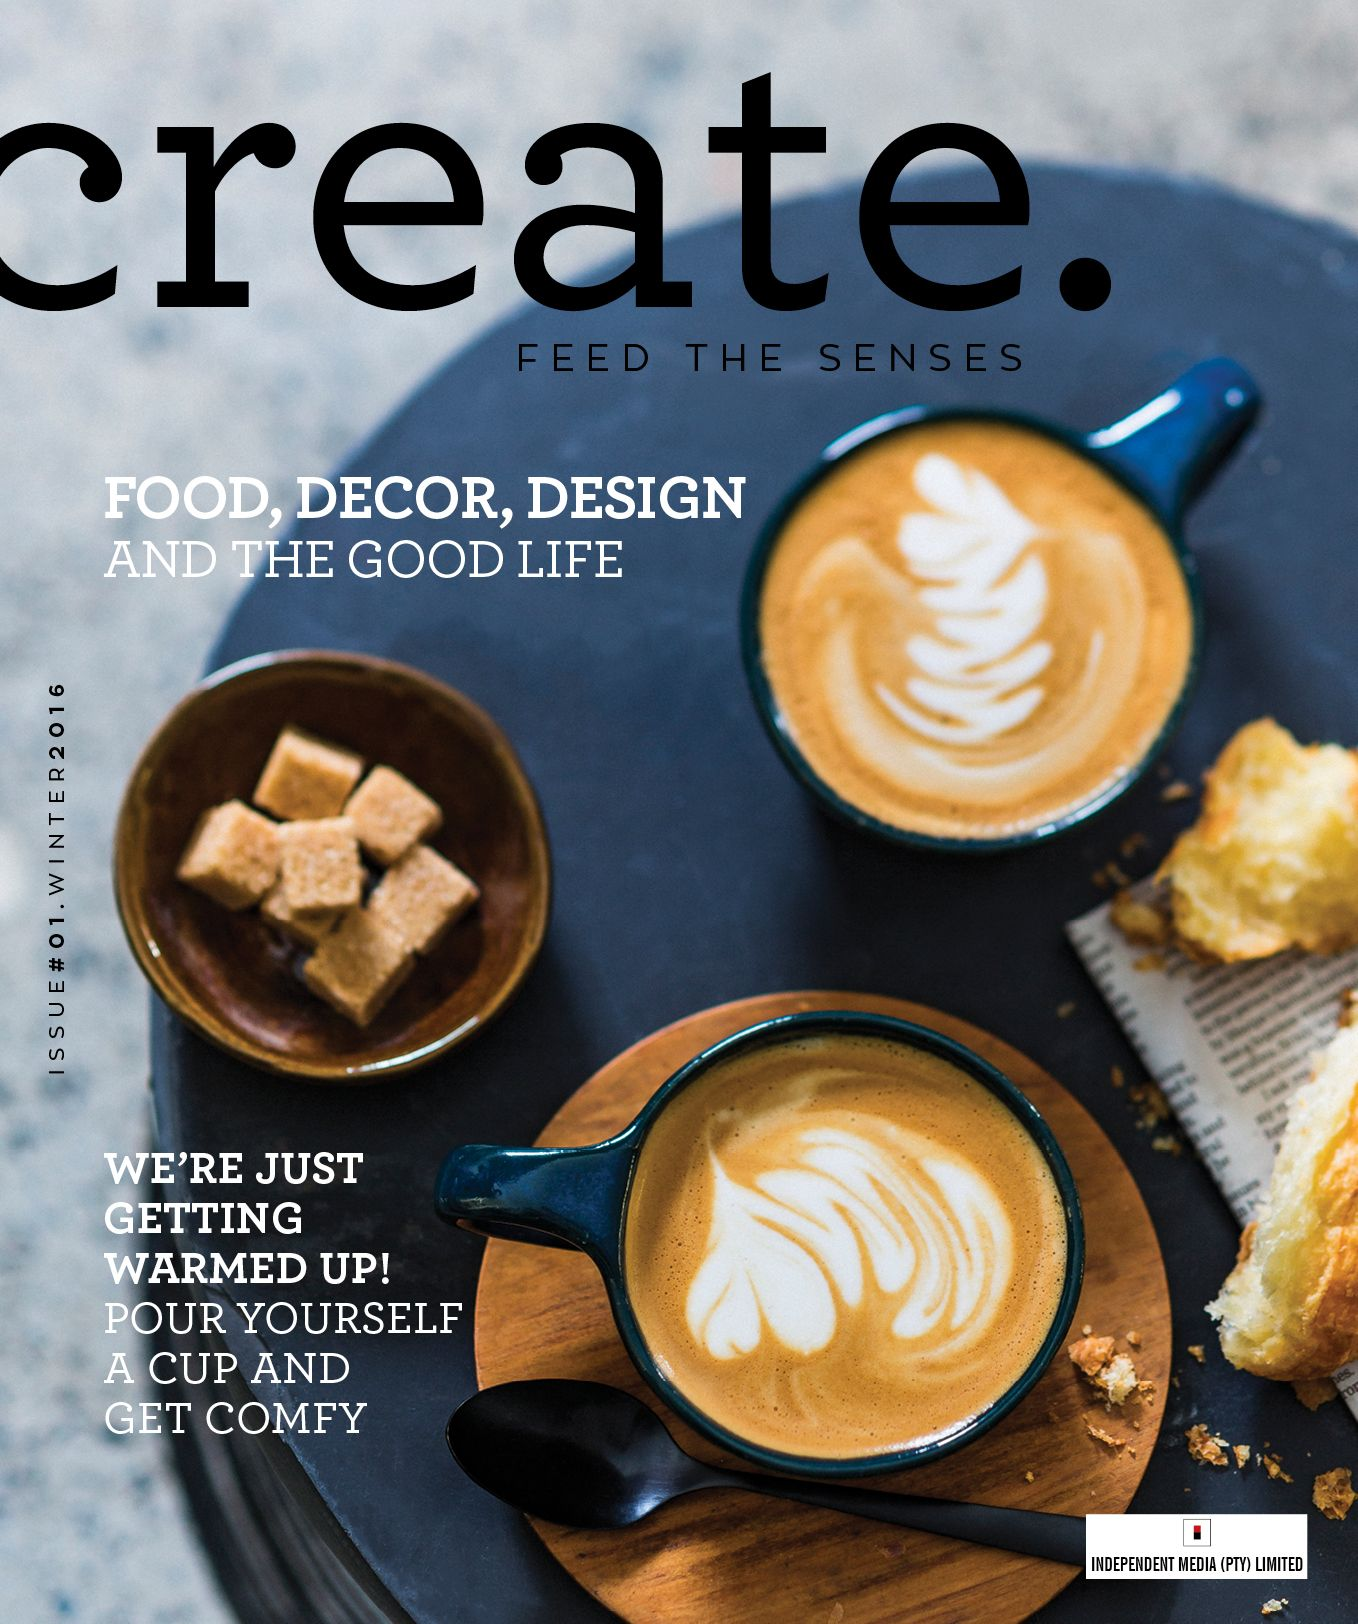 Create. Magazine Issue 1 Cover (unpublished). Art direction/design: Julie Taylor Styling: Anke Roux Photo: Michael la Grange Location: St. James coffee shop